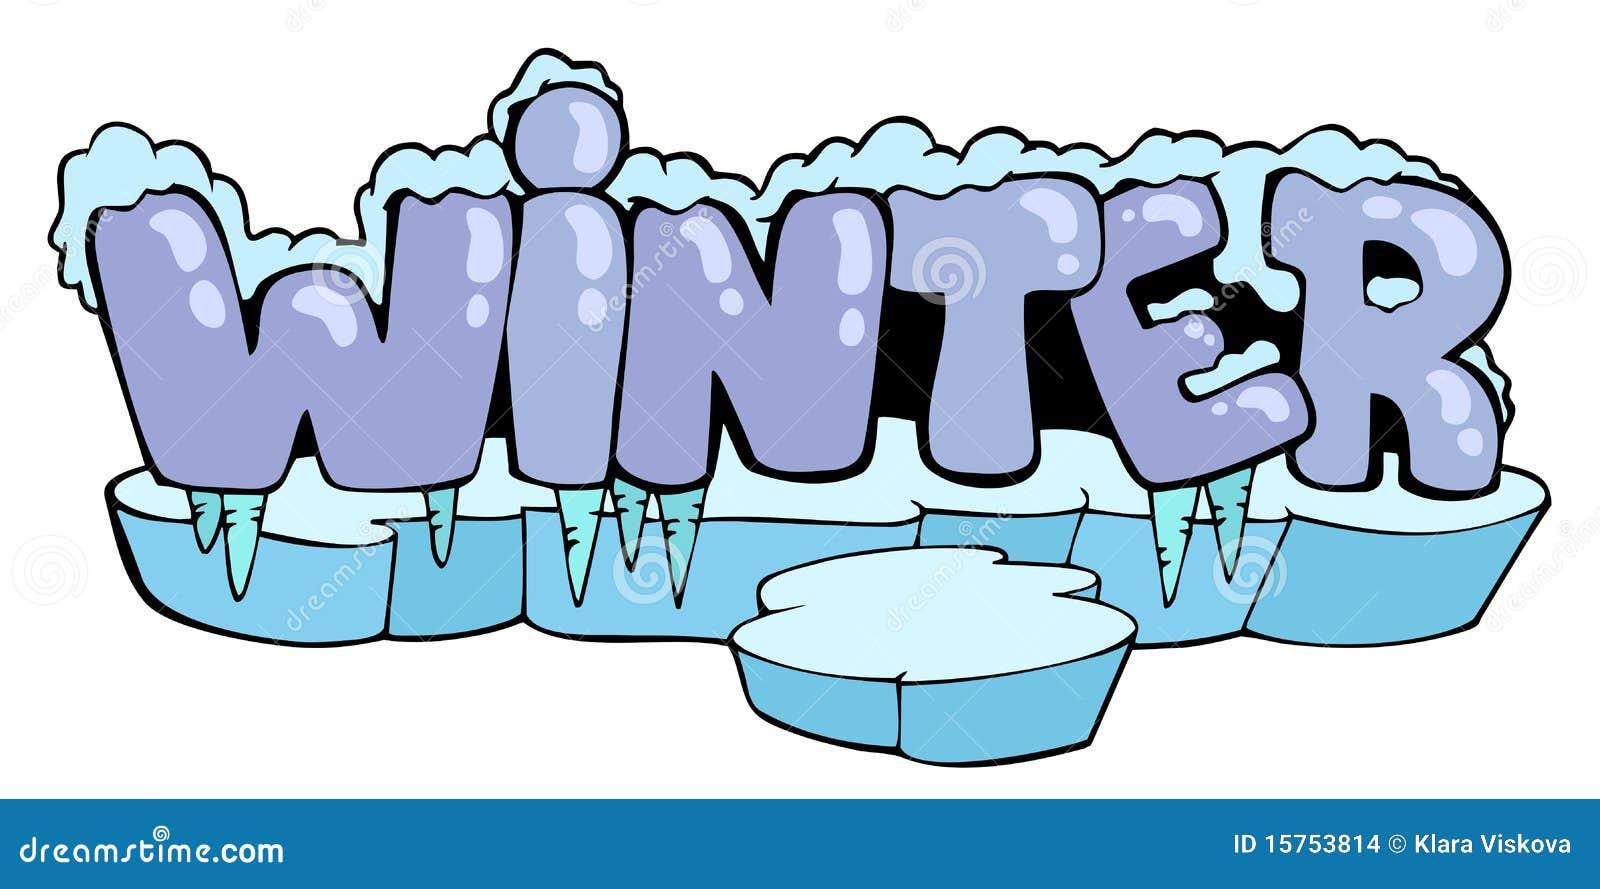 cartoon winter sign stock images image 15753814 clipart penguins peeking clip art penguin outline